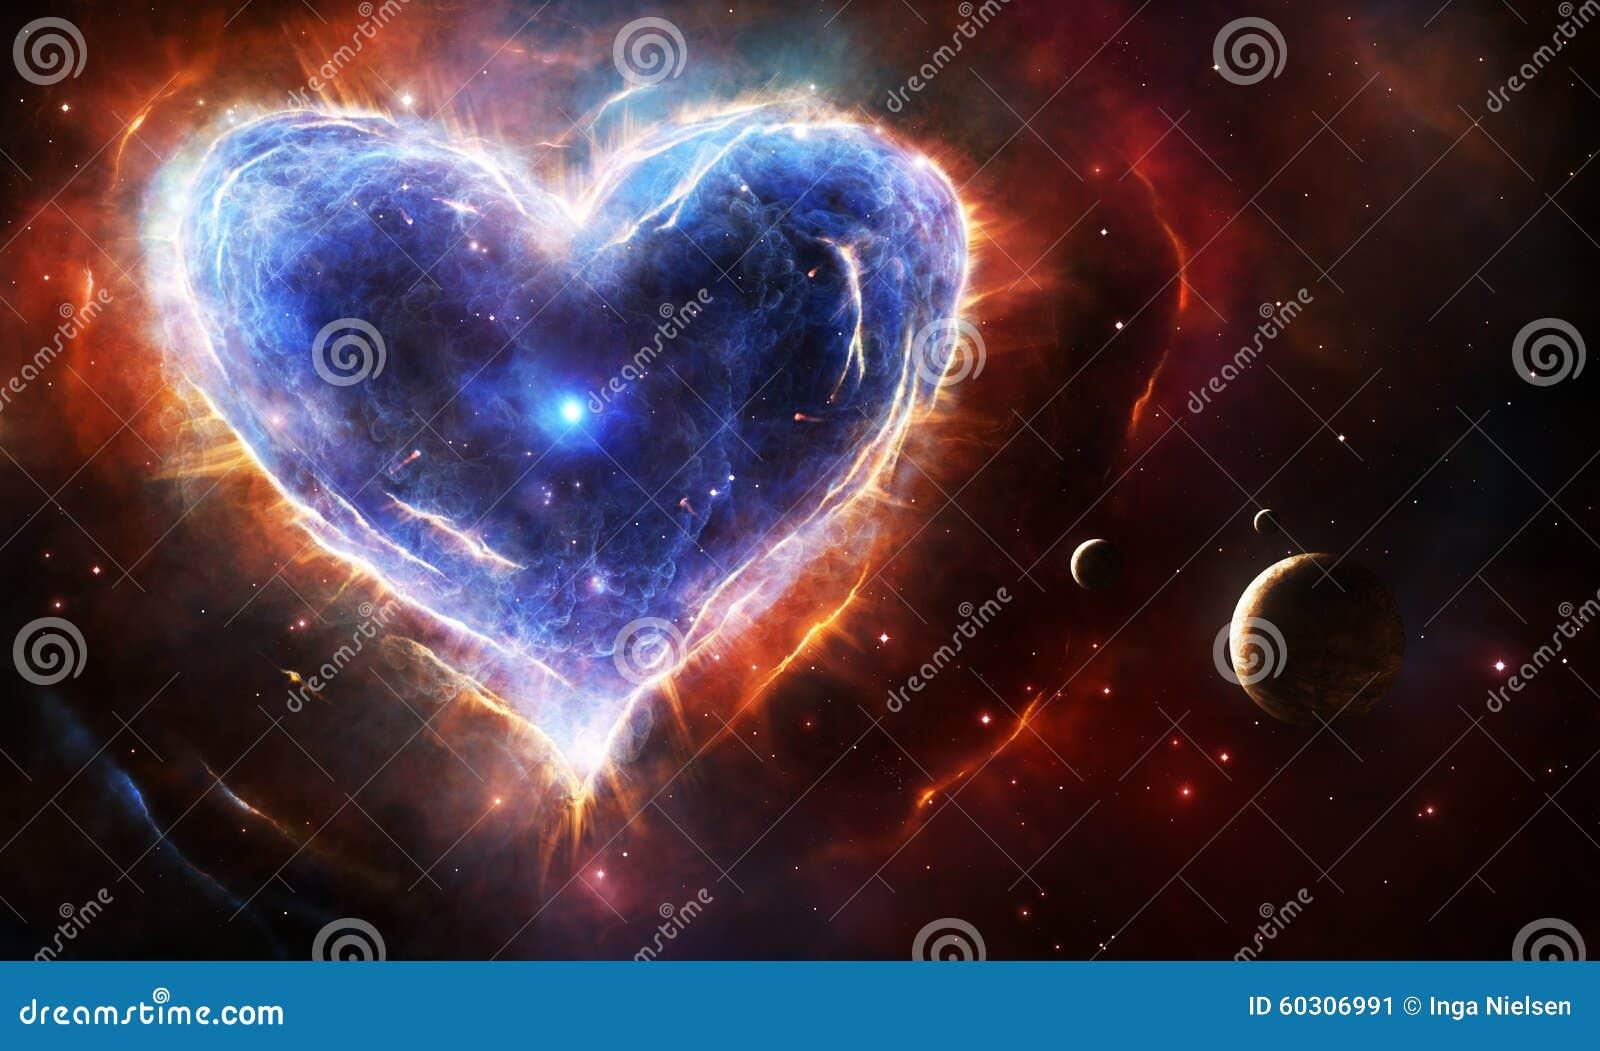 Stock Illustration Supernova Heart Nebula Shape Planets Stars Image60306991 on Space Planets